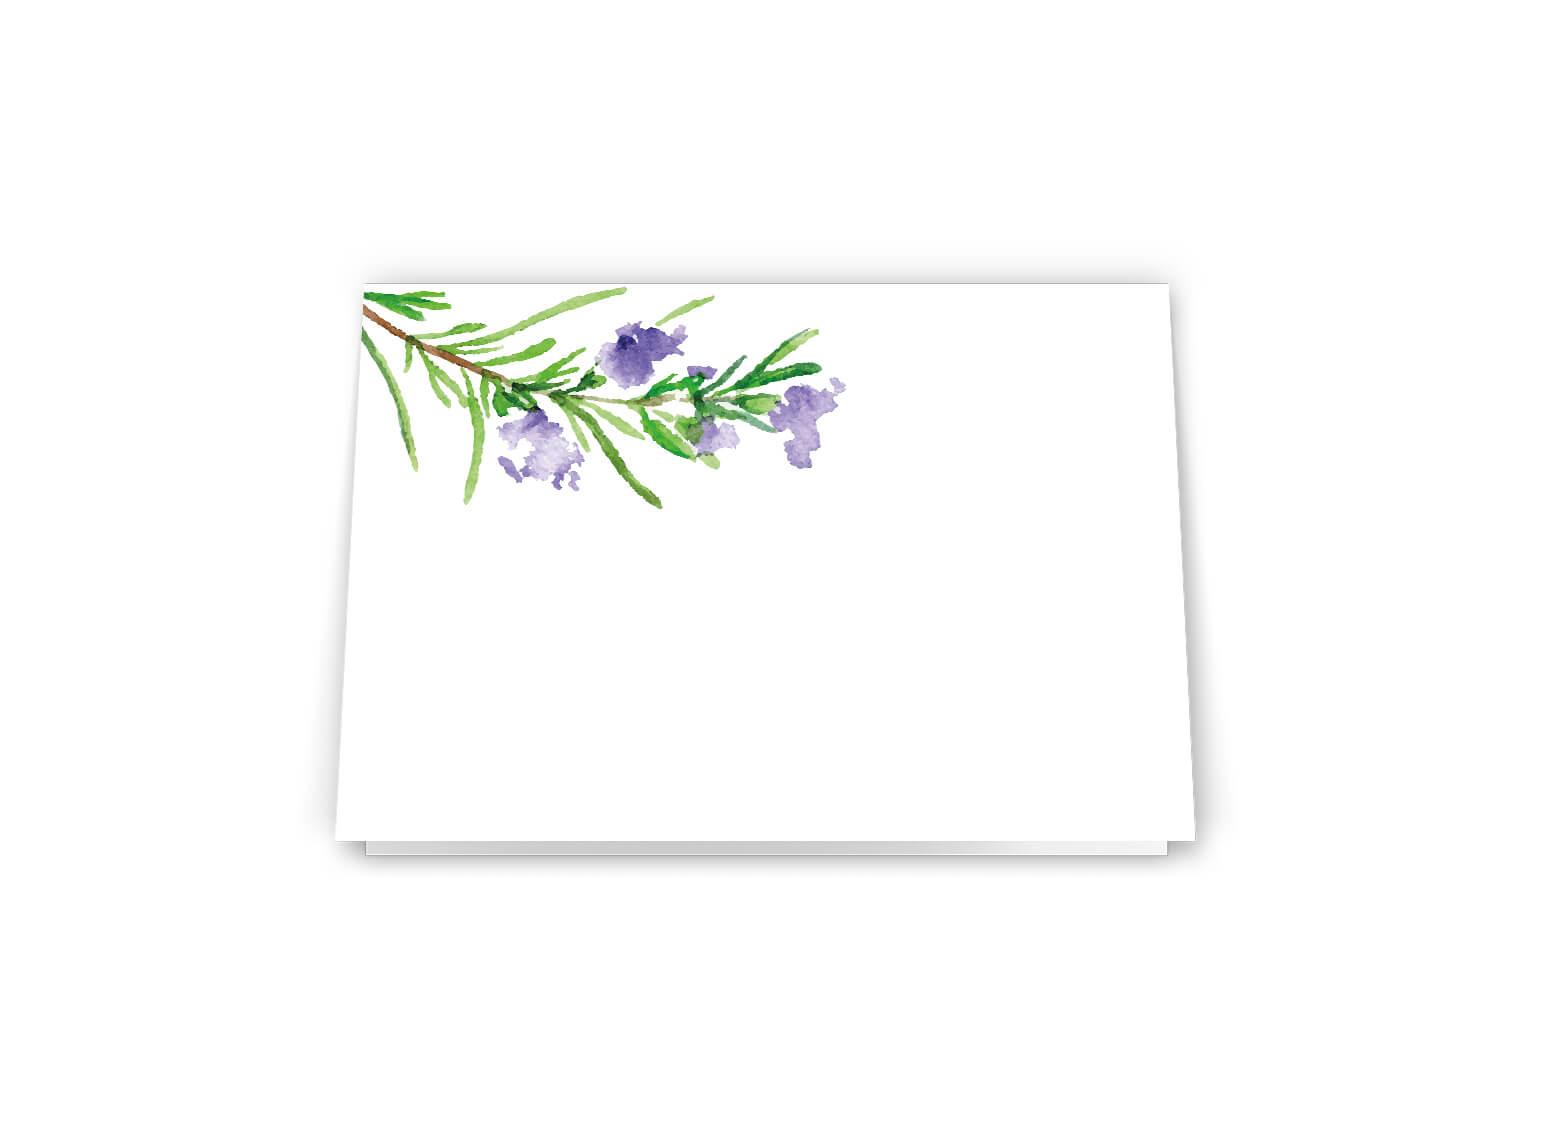 hochzeit-namenskarte-rosmarin-violet-aquarell-vintage_MP0022-4.2.2